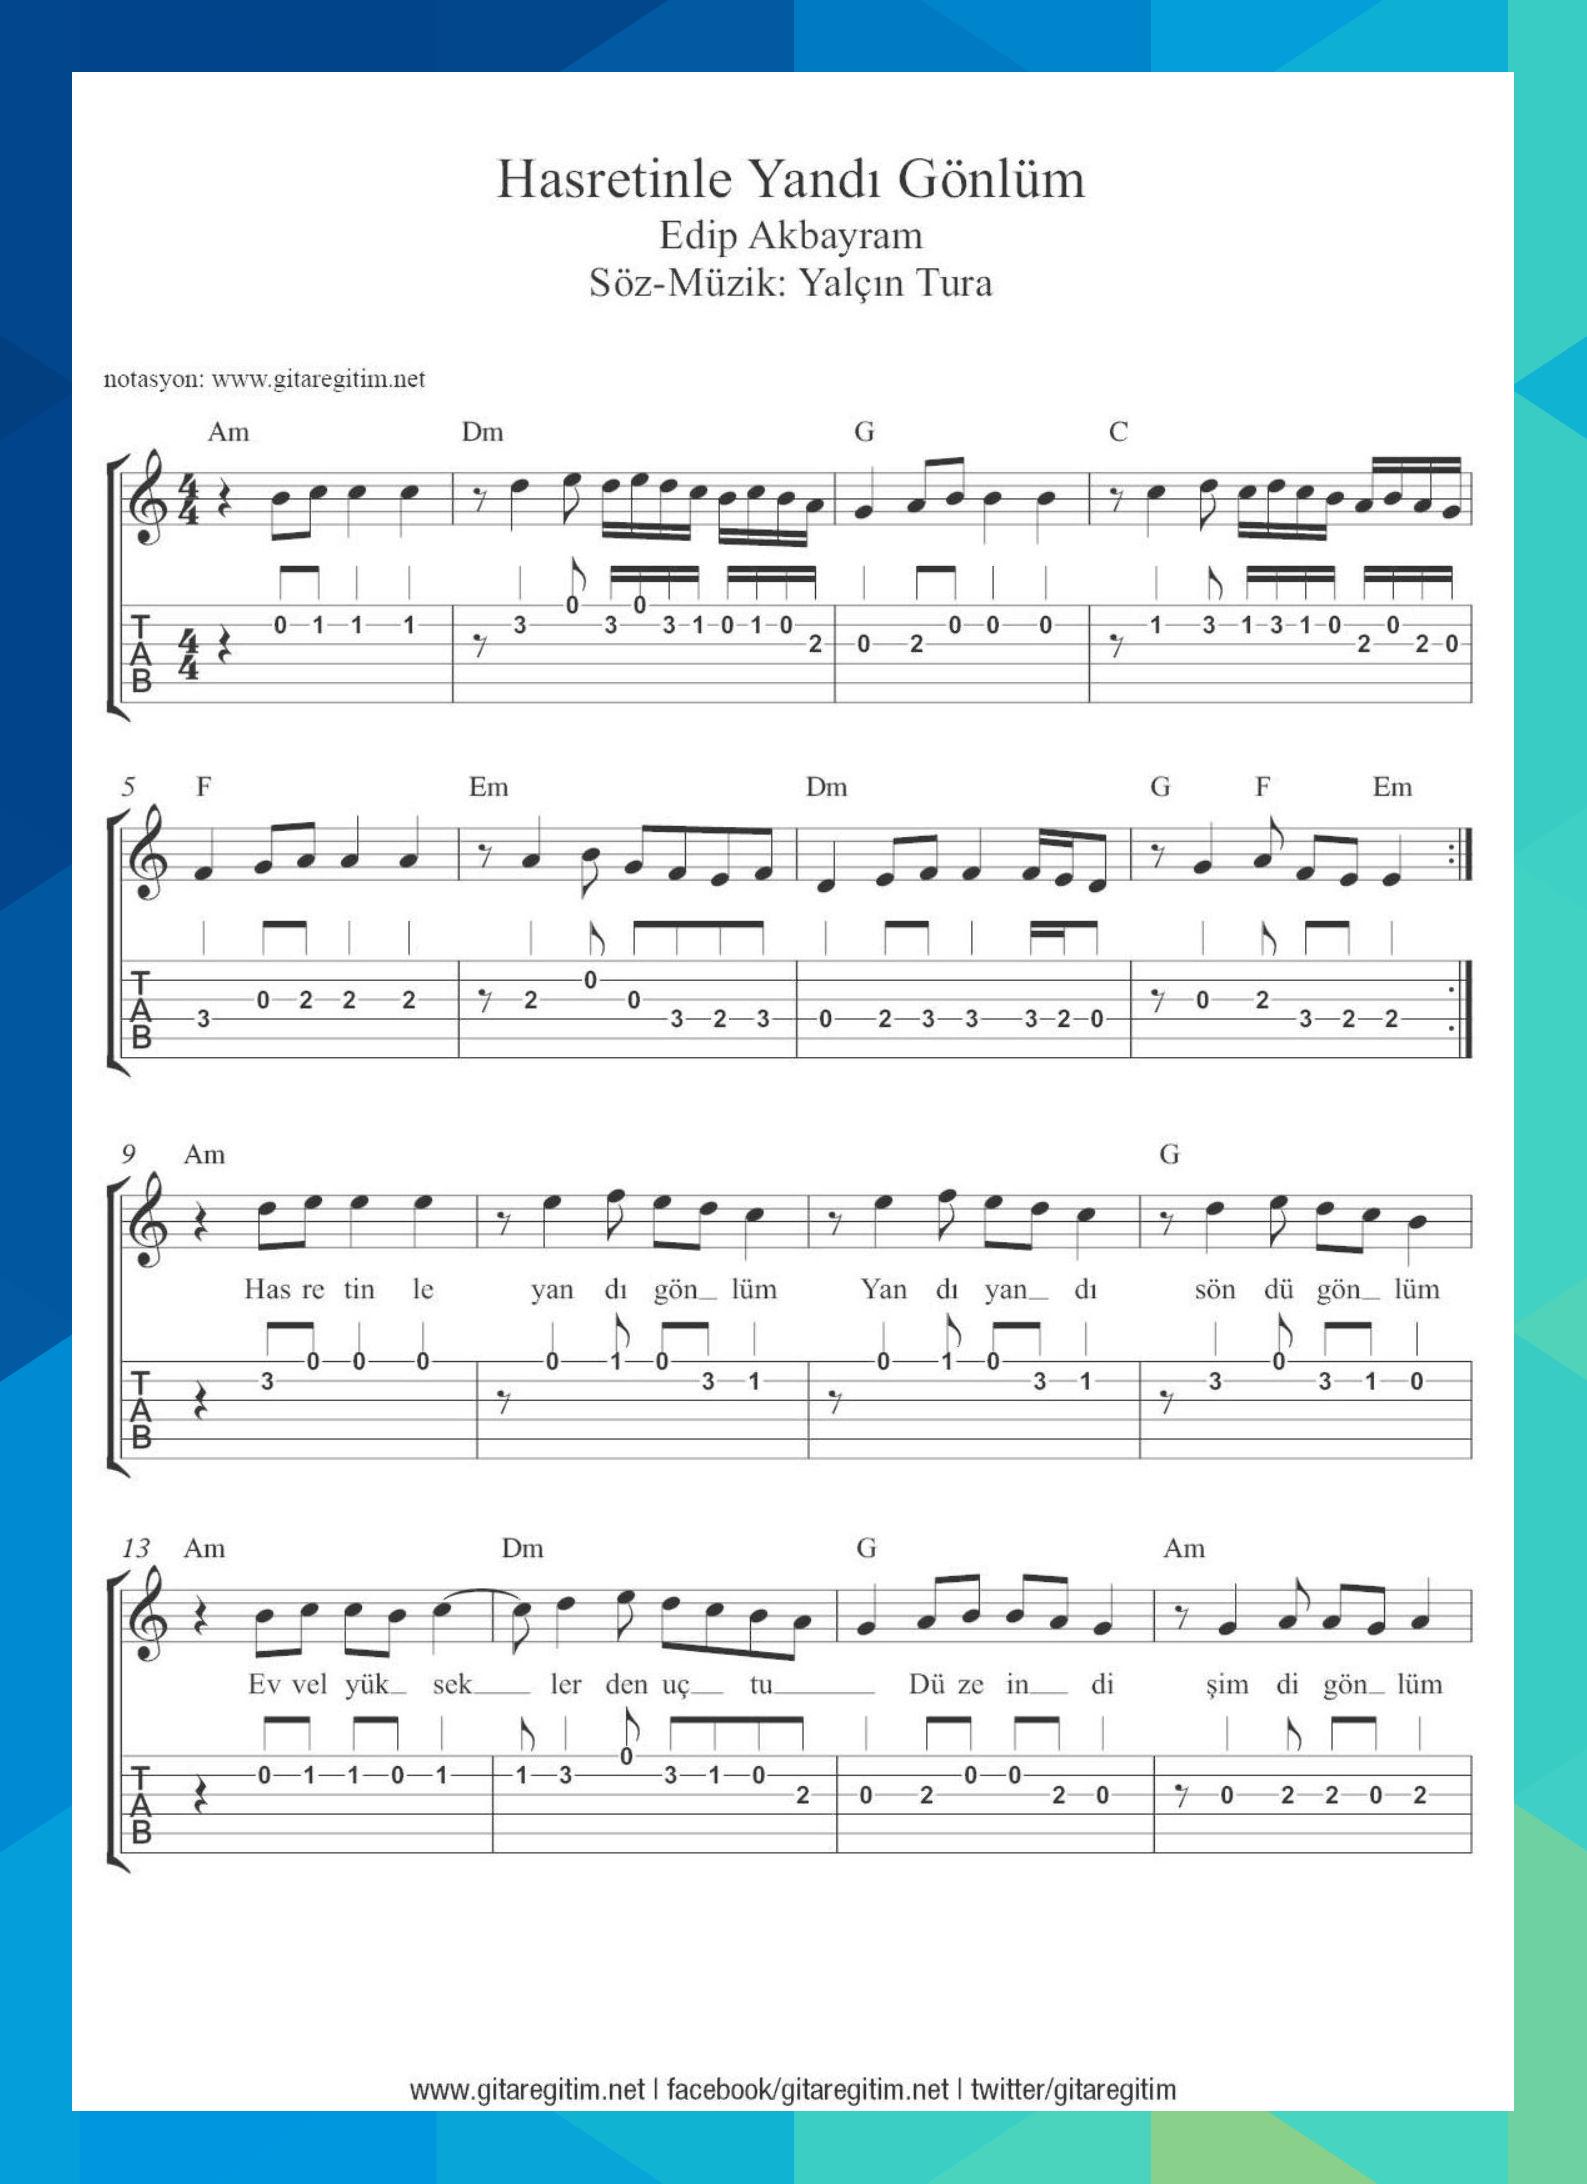 Hasretinle Yandi Gonlum Nota Tab Akor Alena81494 Muzik Notalari Muzik Muzik Egitimi